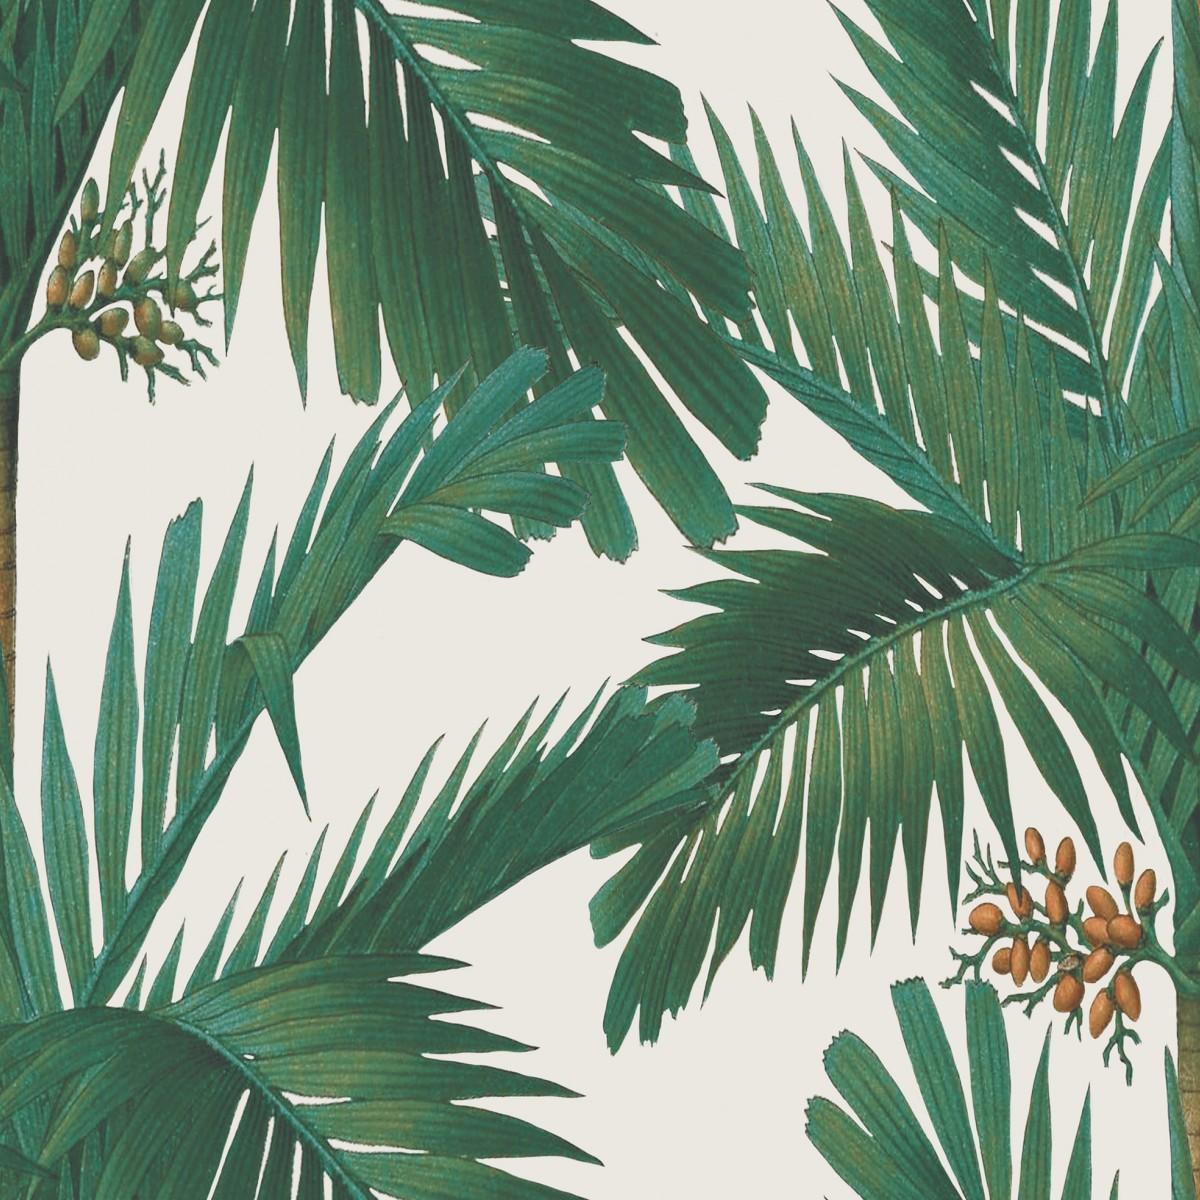 Tapet personalizabil Palm Spring, Rebel Walls, 5 mp / rola